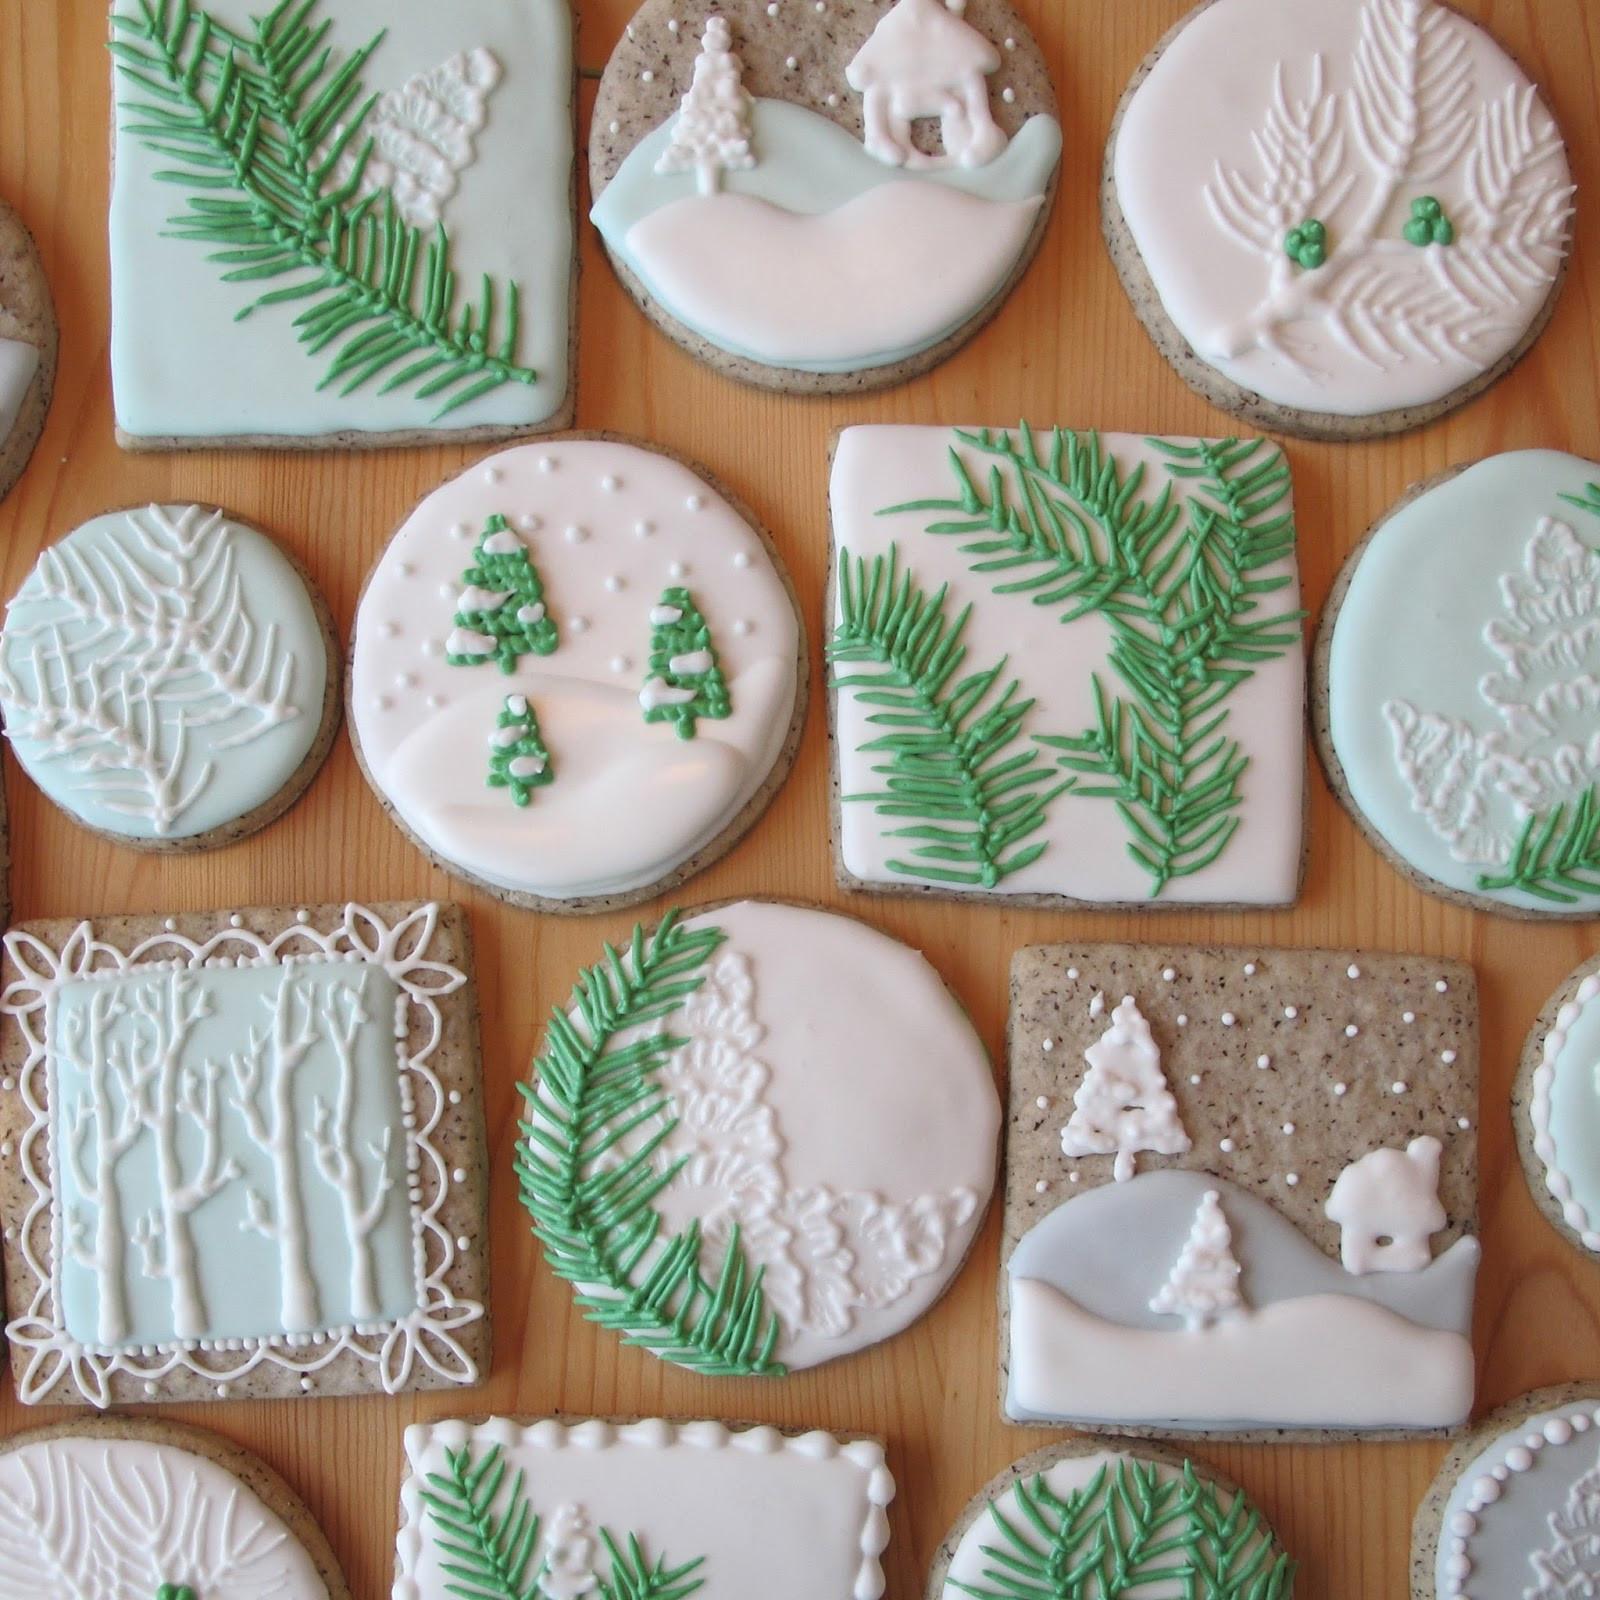 Royal Icing Recipe For Sugar Cookies  Christmas Sugar Cookies With Royal Icing – Happy Holidays